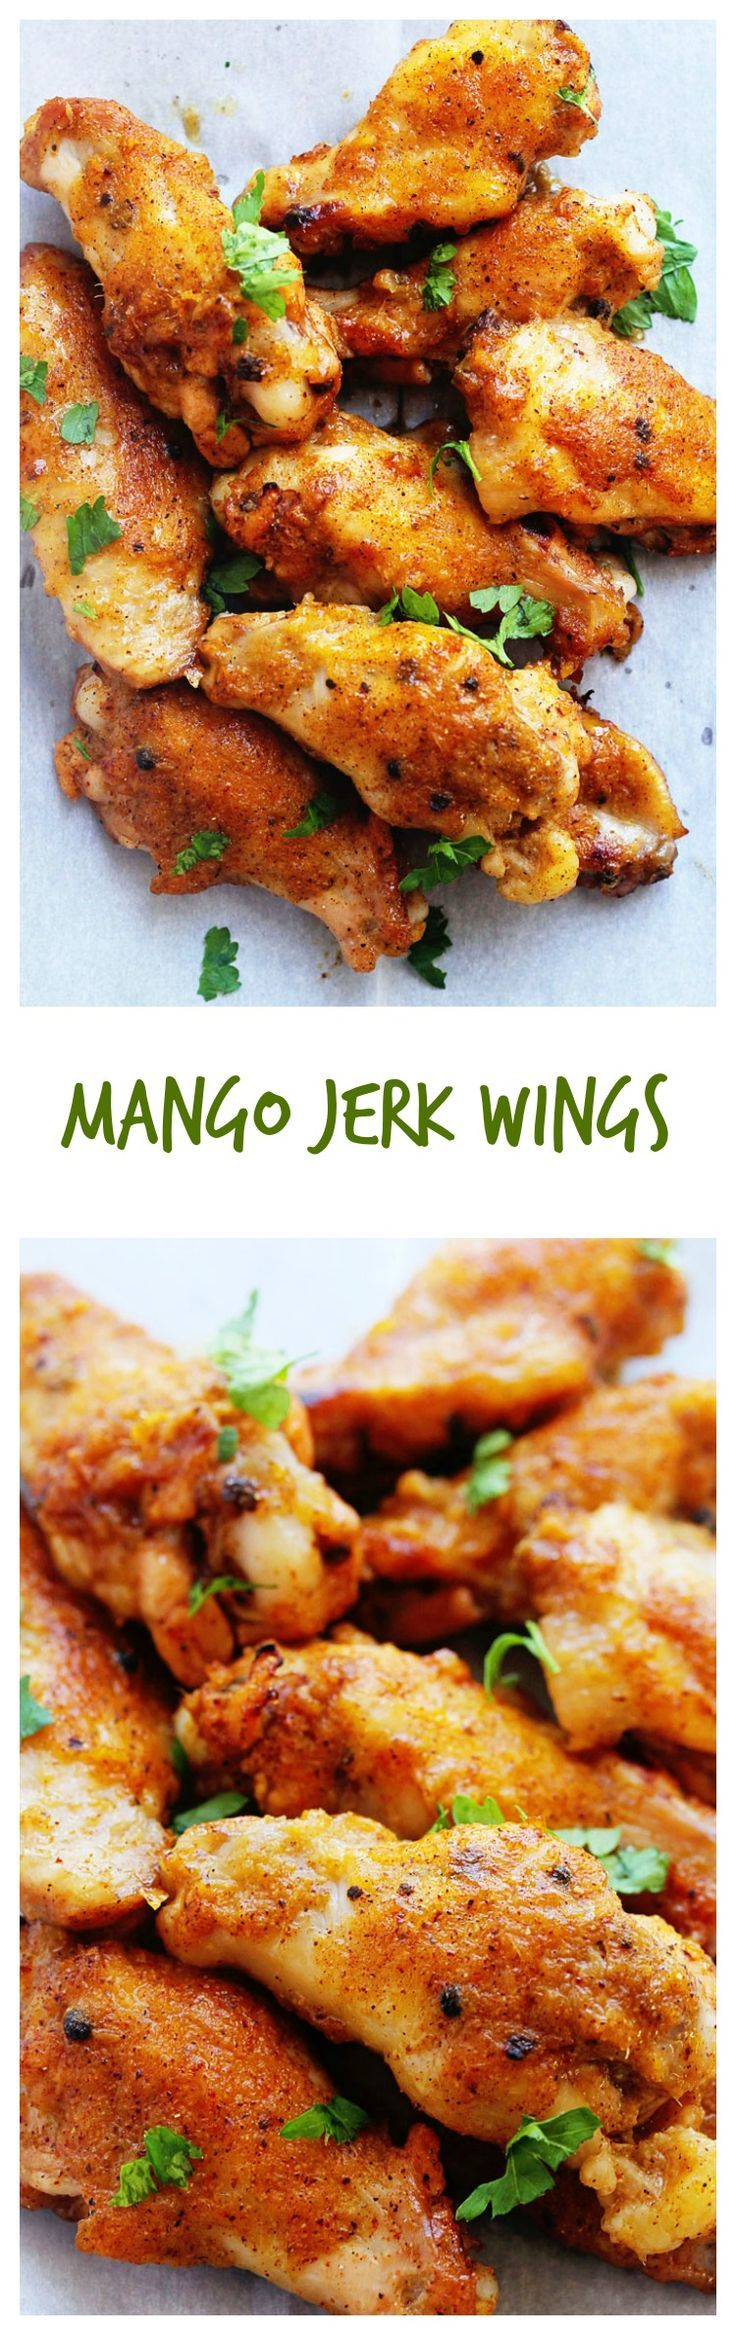 Mango Jerk Wings | Grandbaby Cakes